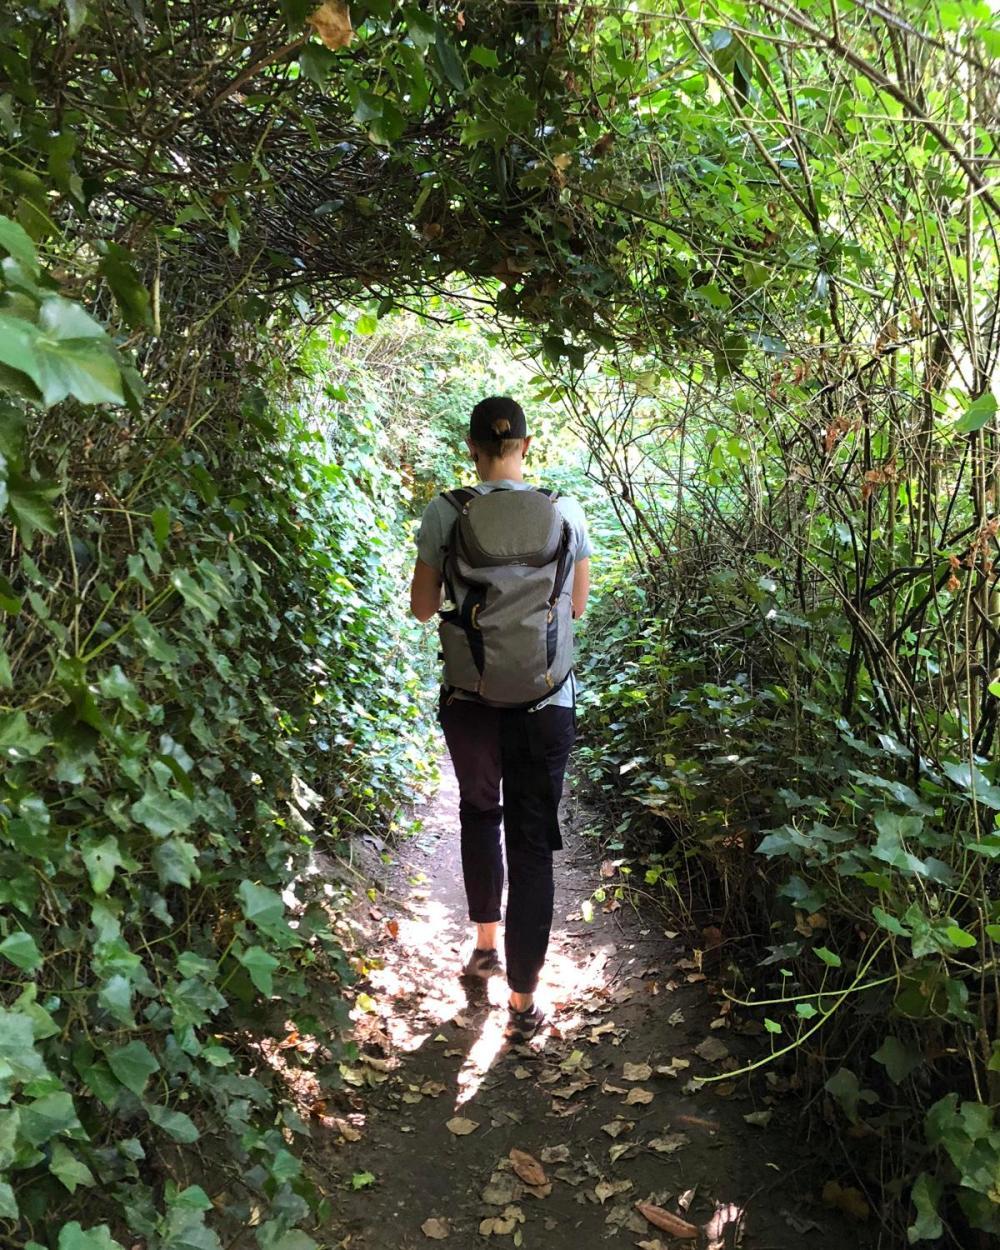 Splodz Blogz | Green Space in Shrewsbury